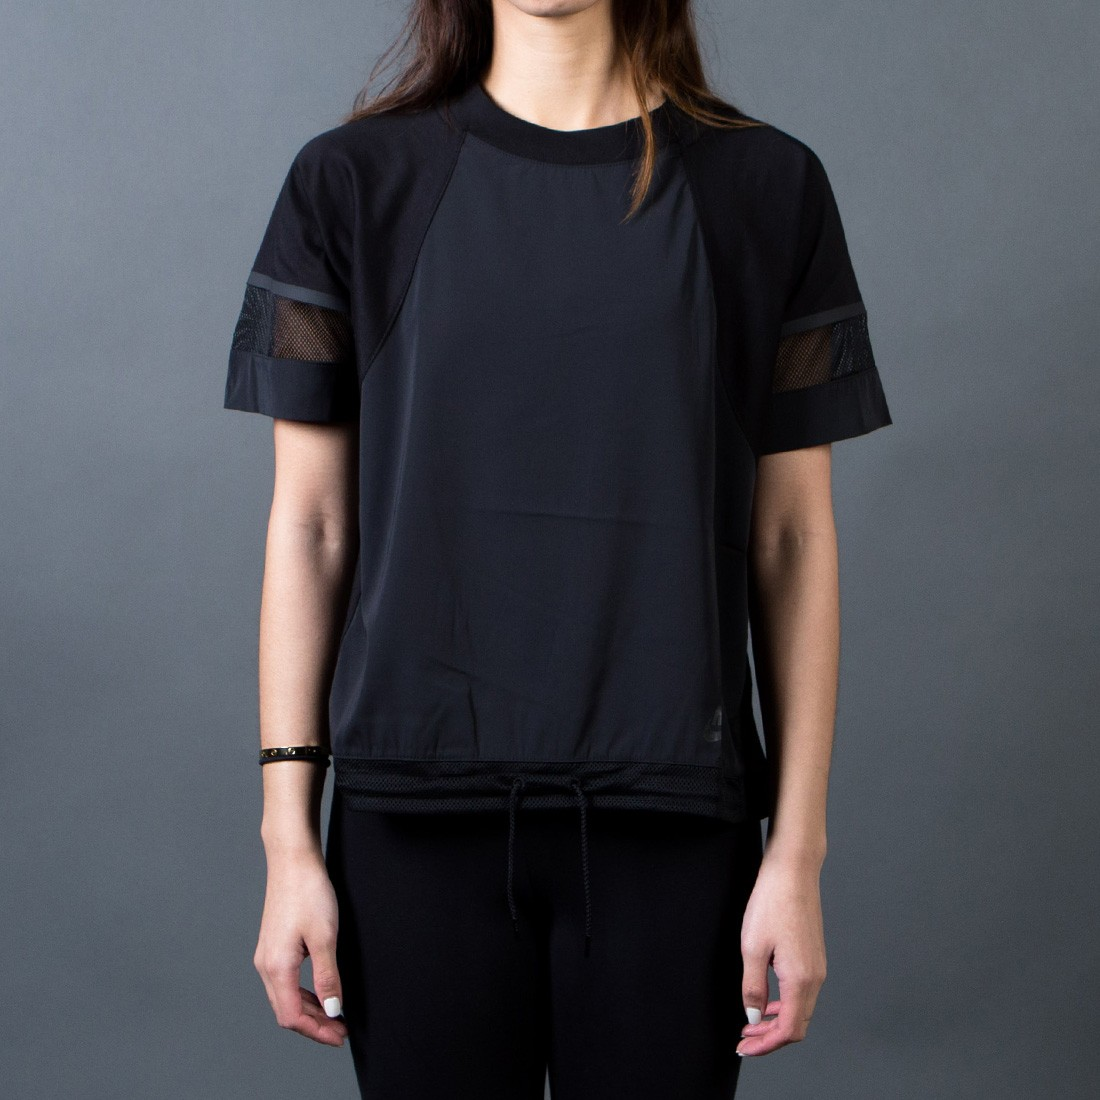 Nike Women Bonded Tee (black)